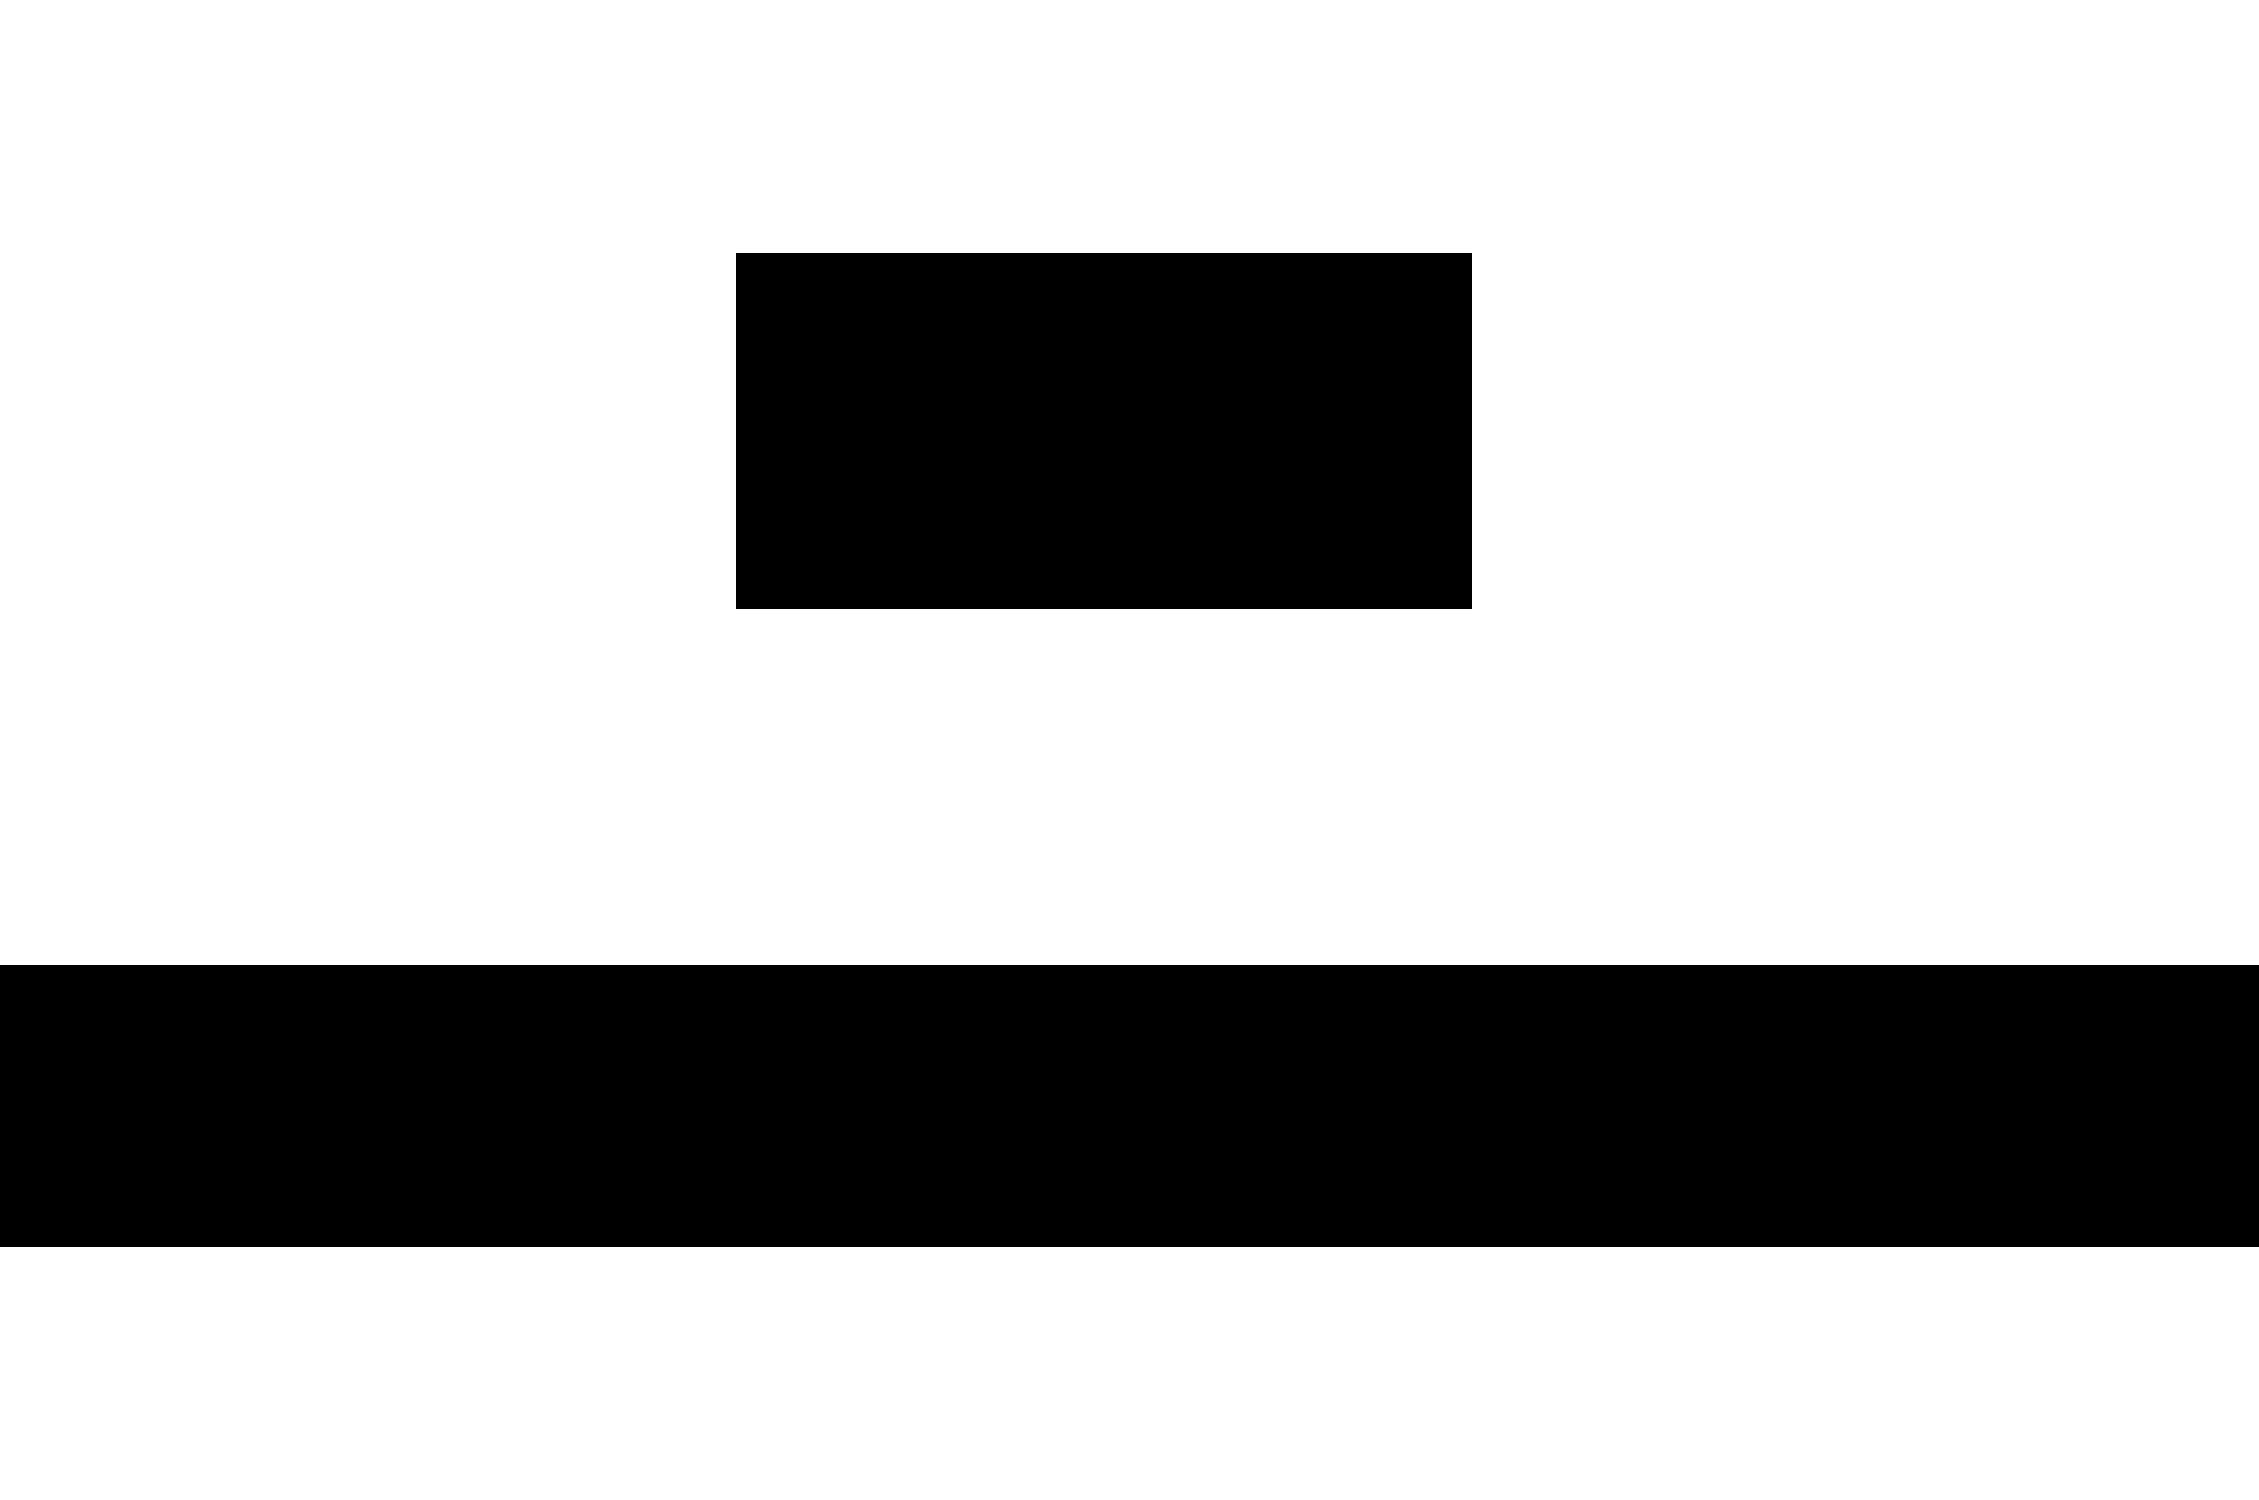 Sweatcity master logo   full